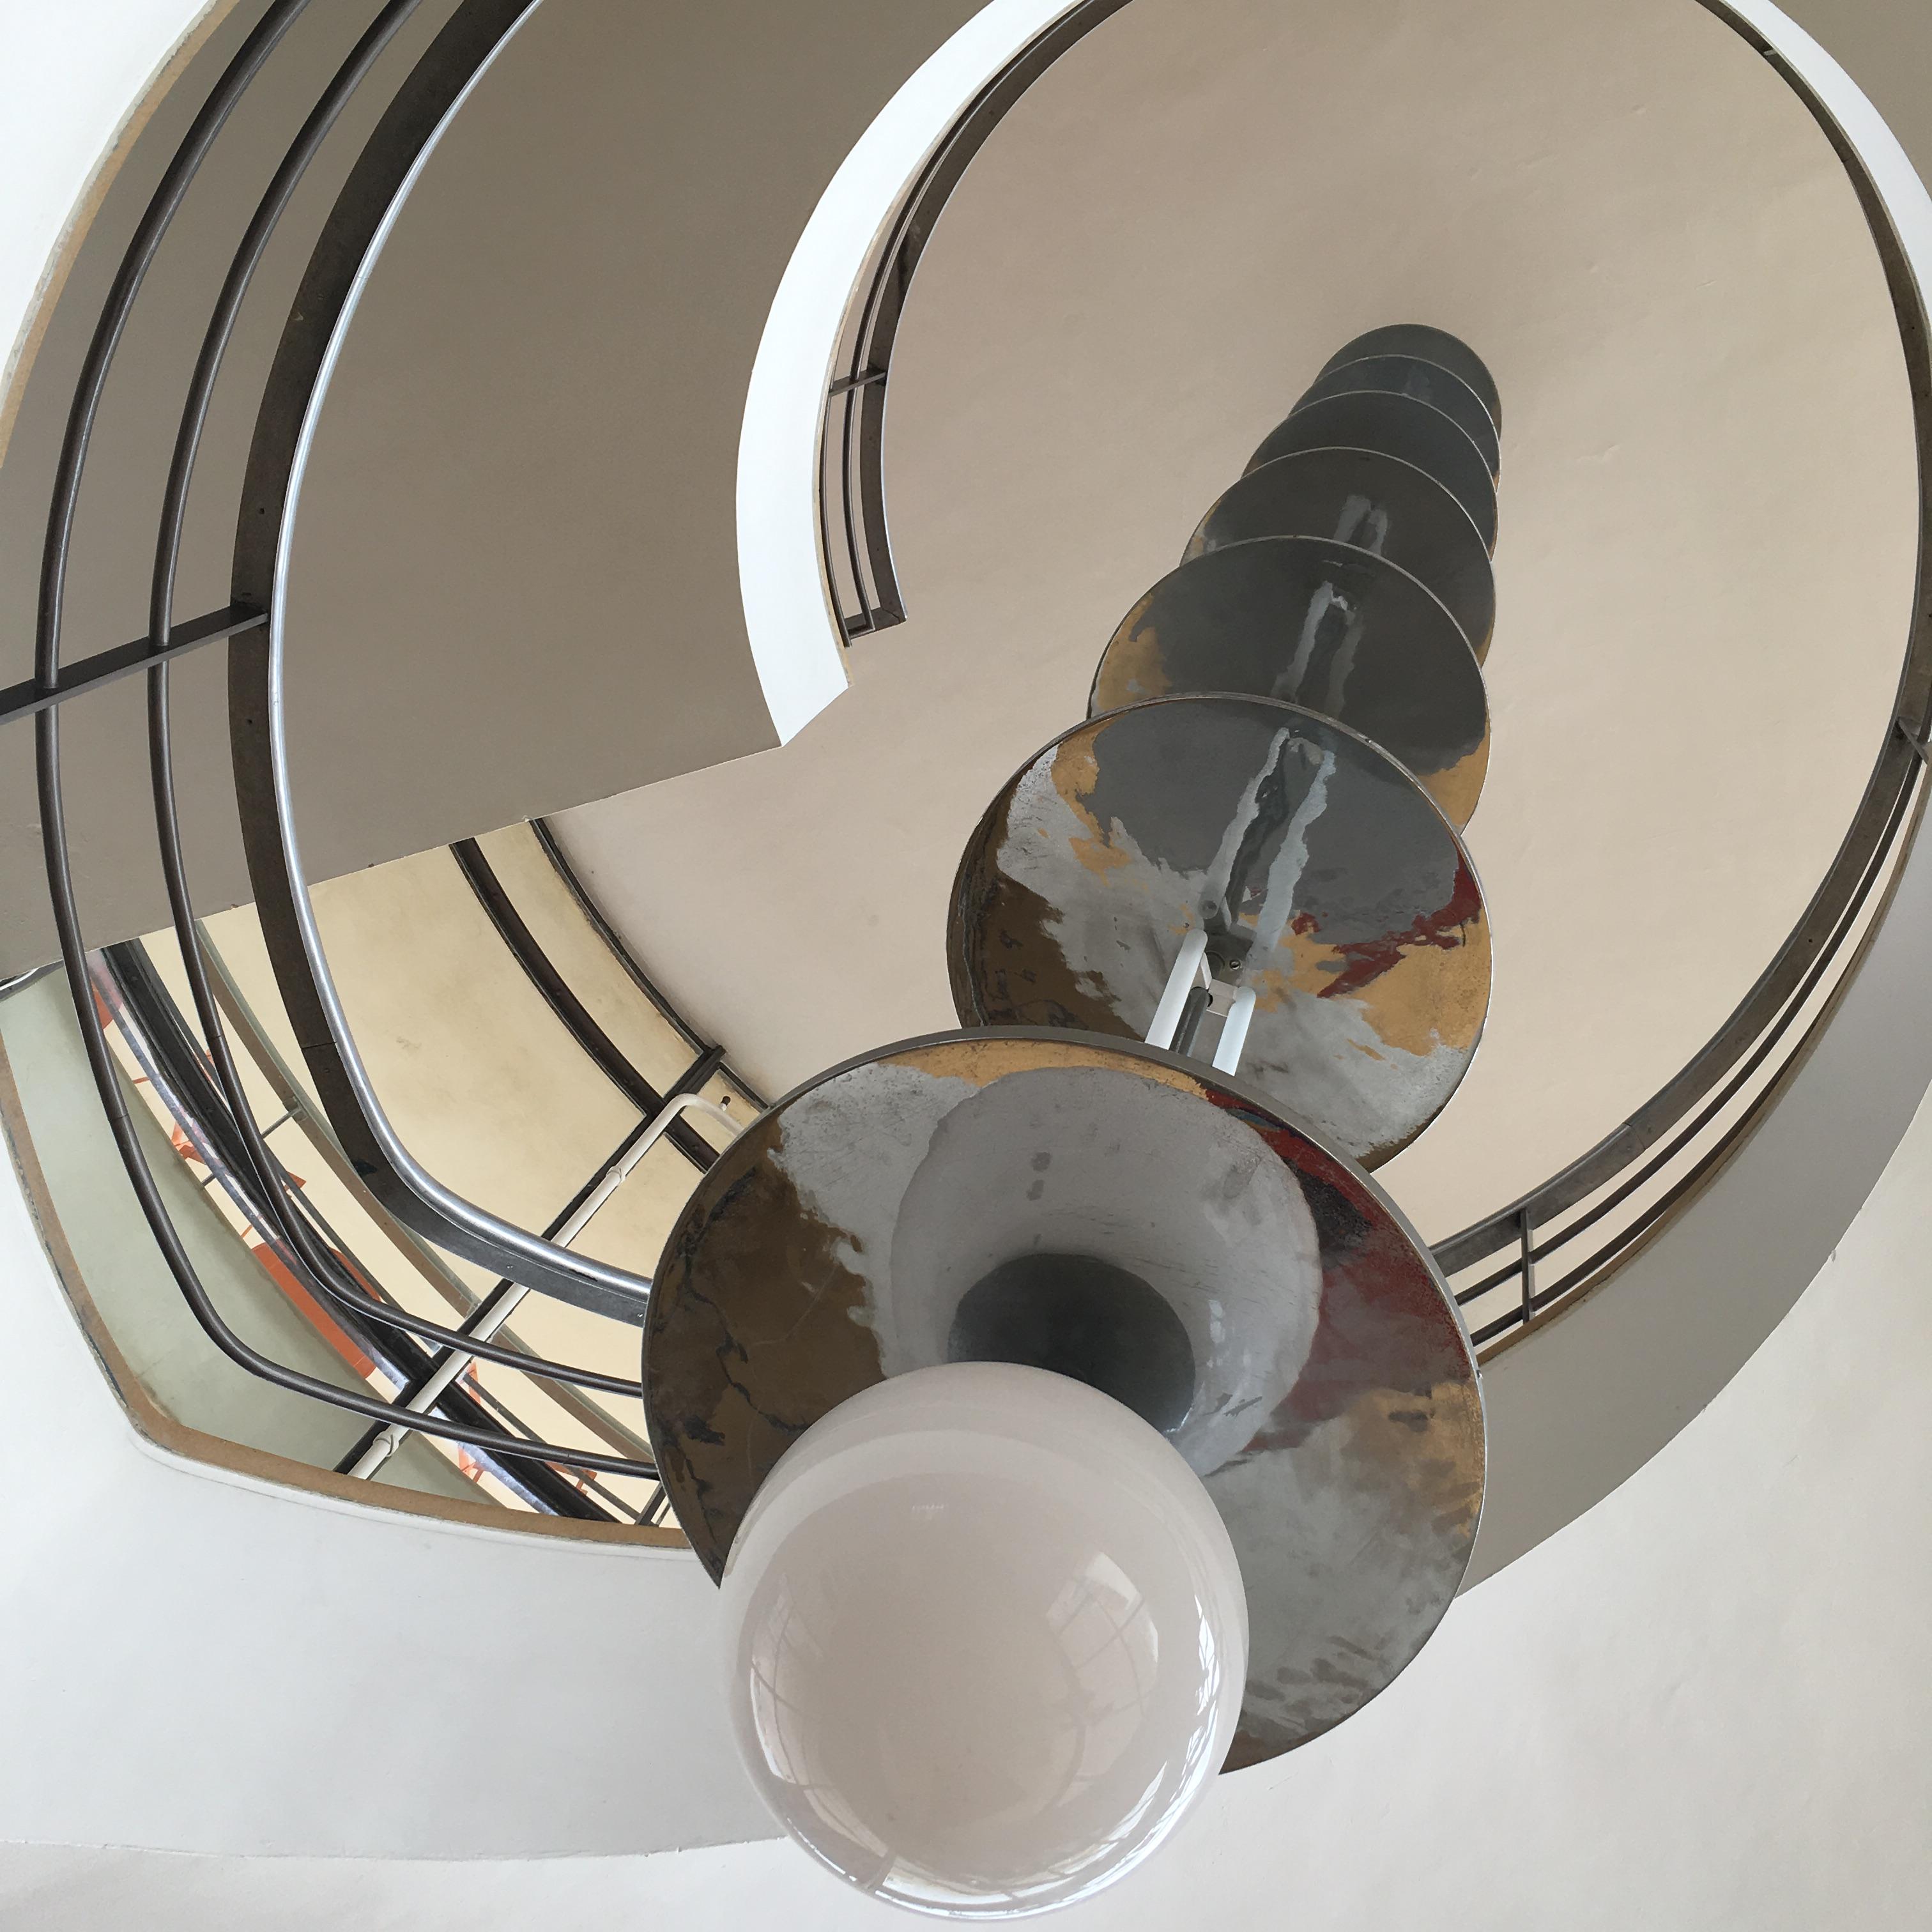 De La Warr Pavilion, Bexhill-on-Sea, East Sussex - interior staircase